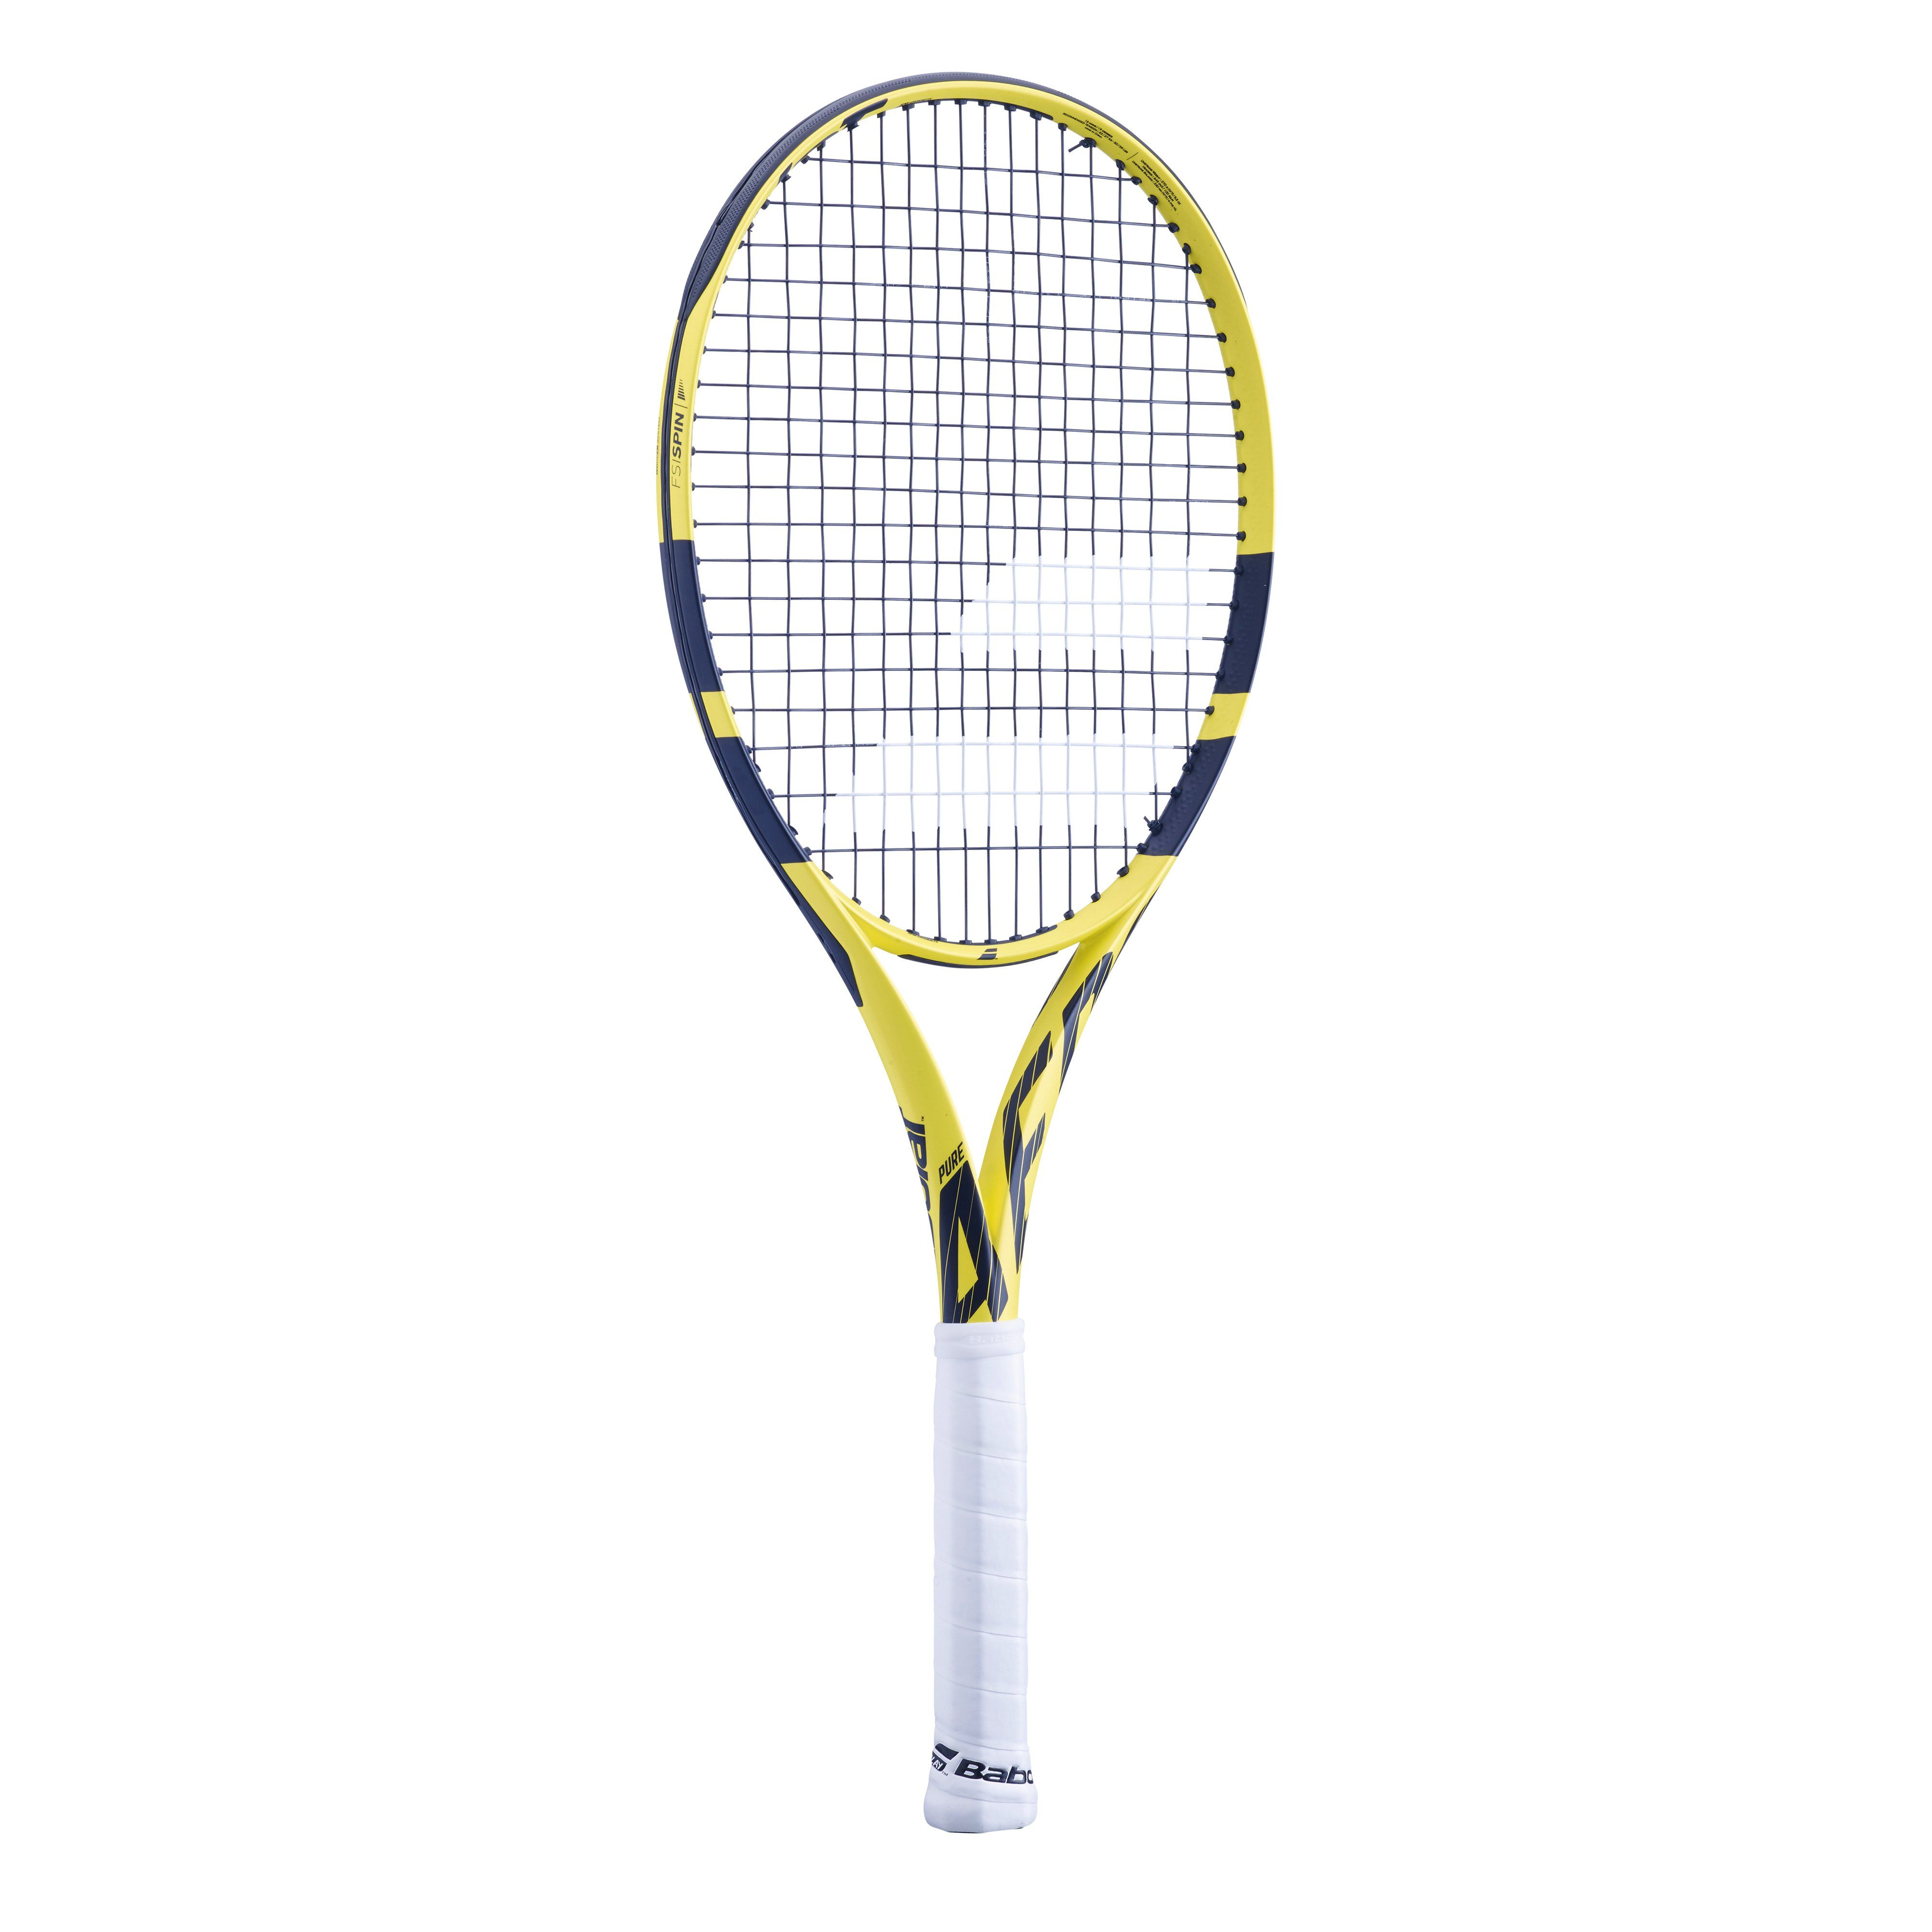 Babolat Pure Aero Super Lite Tennis Racket